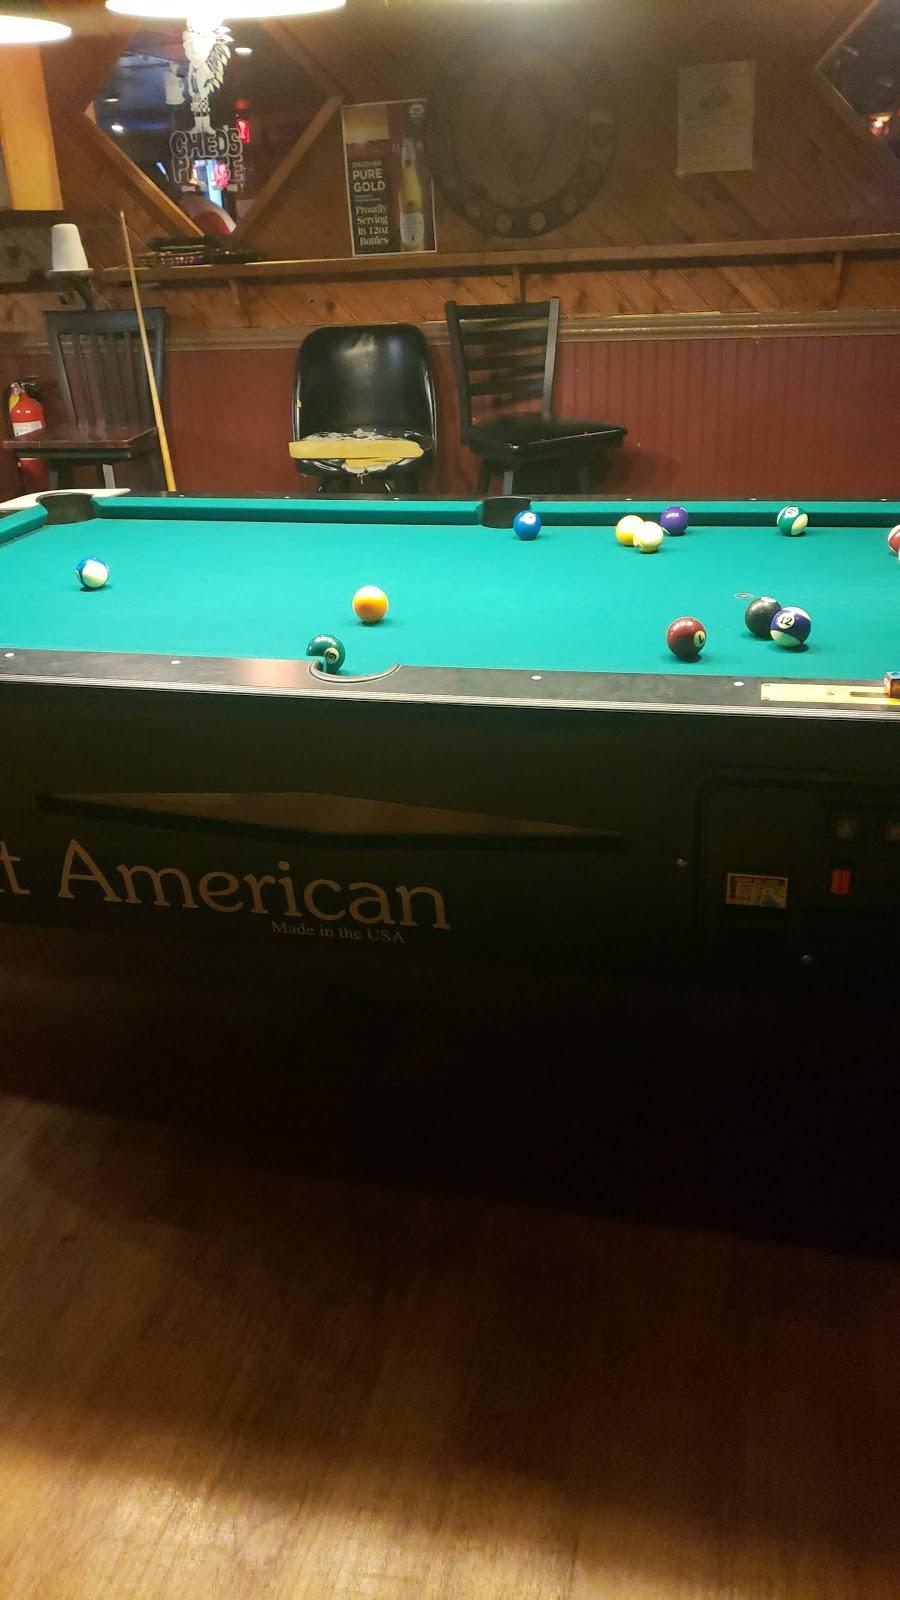 Cheds Bar and Grill - restaurant  | Photo 5 of 10 | Address: 4676 Princess Anne Rd unit 390, Virginia Beach, VA 23462, USA | Phone: (757) 495-8311